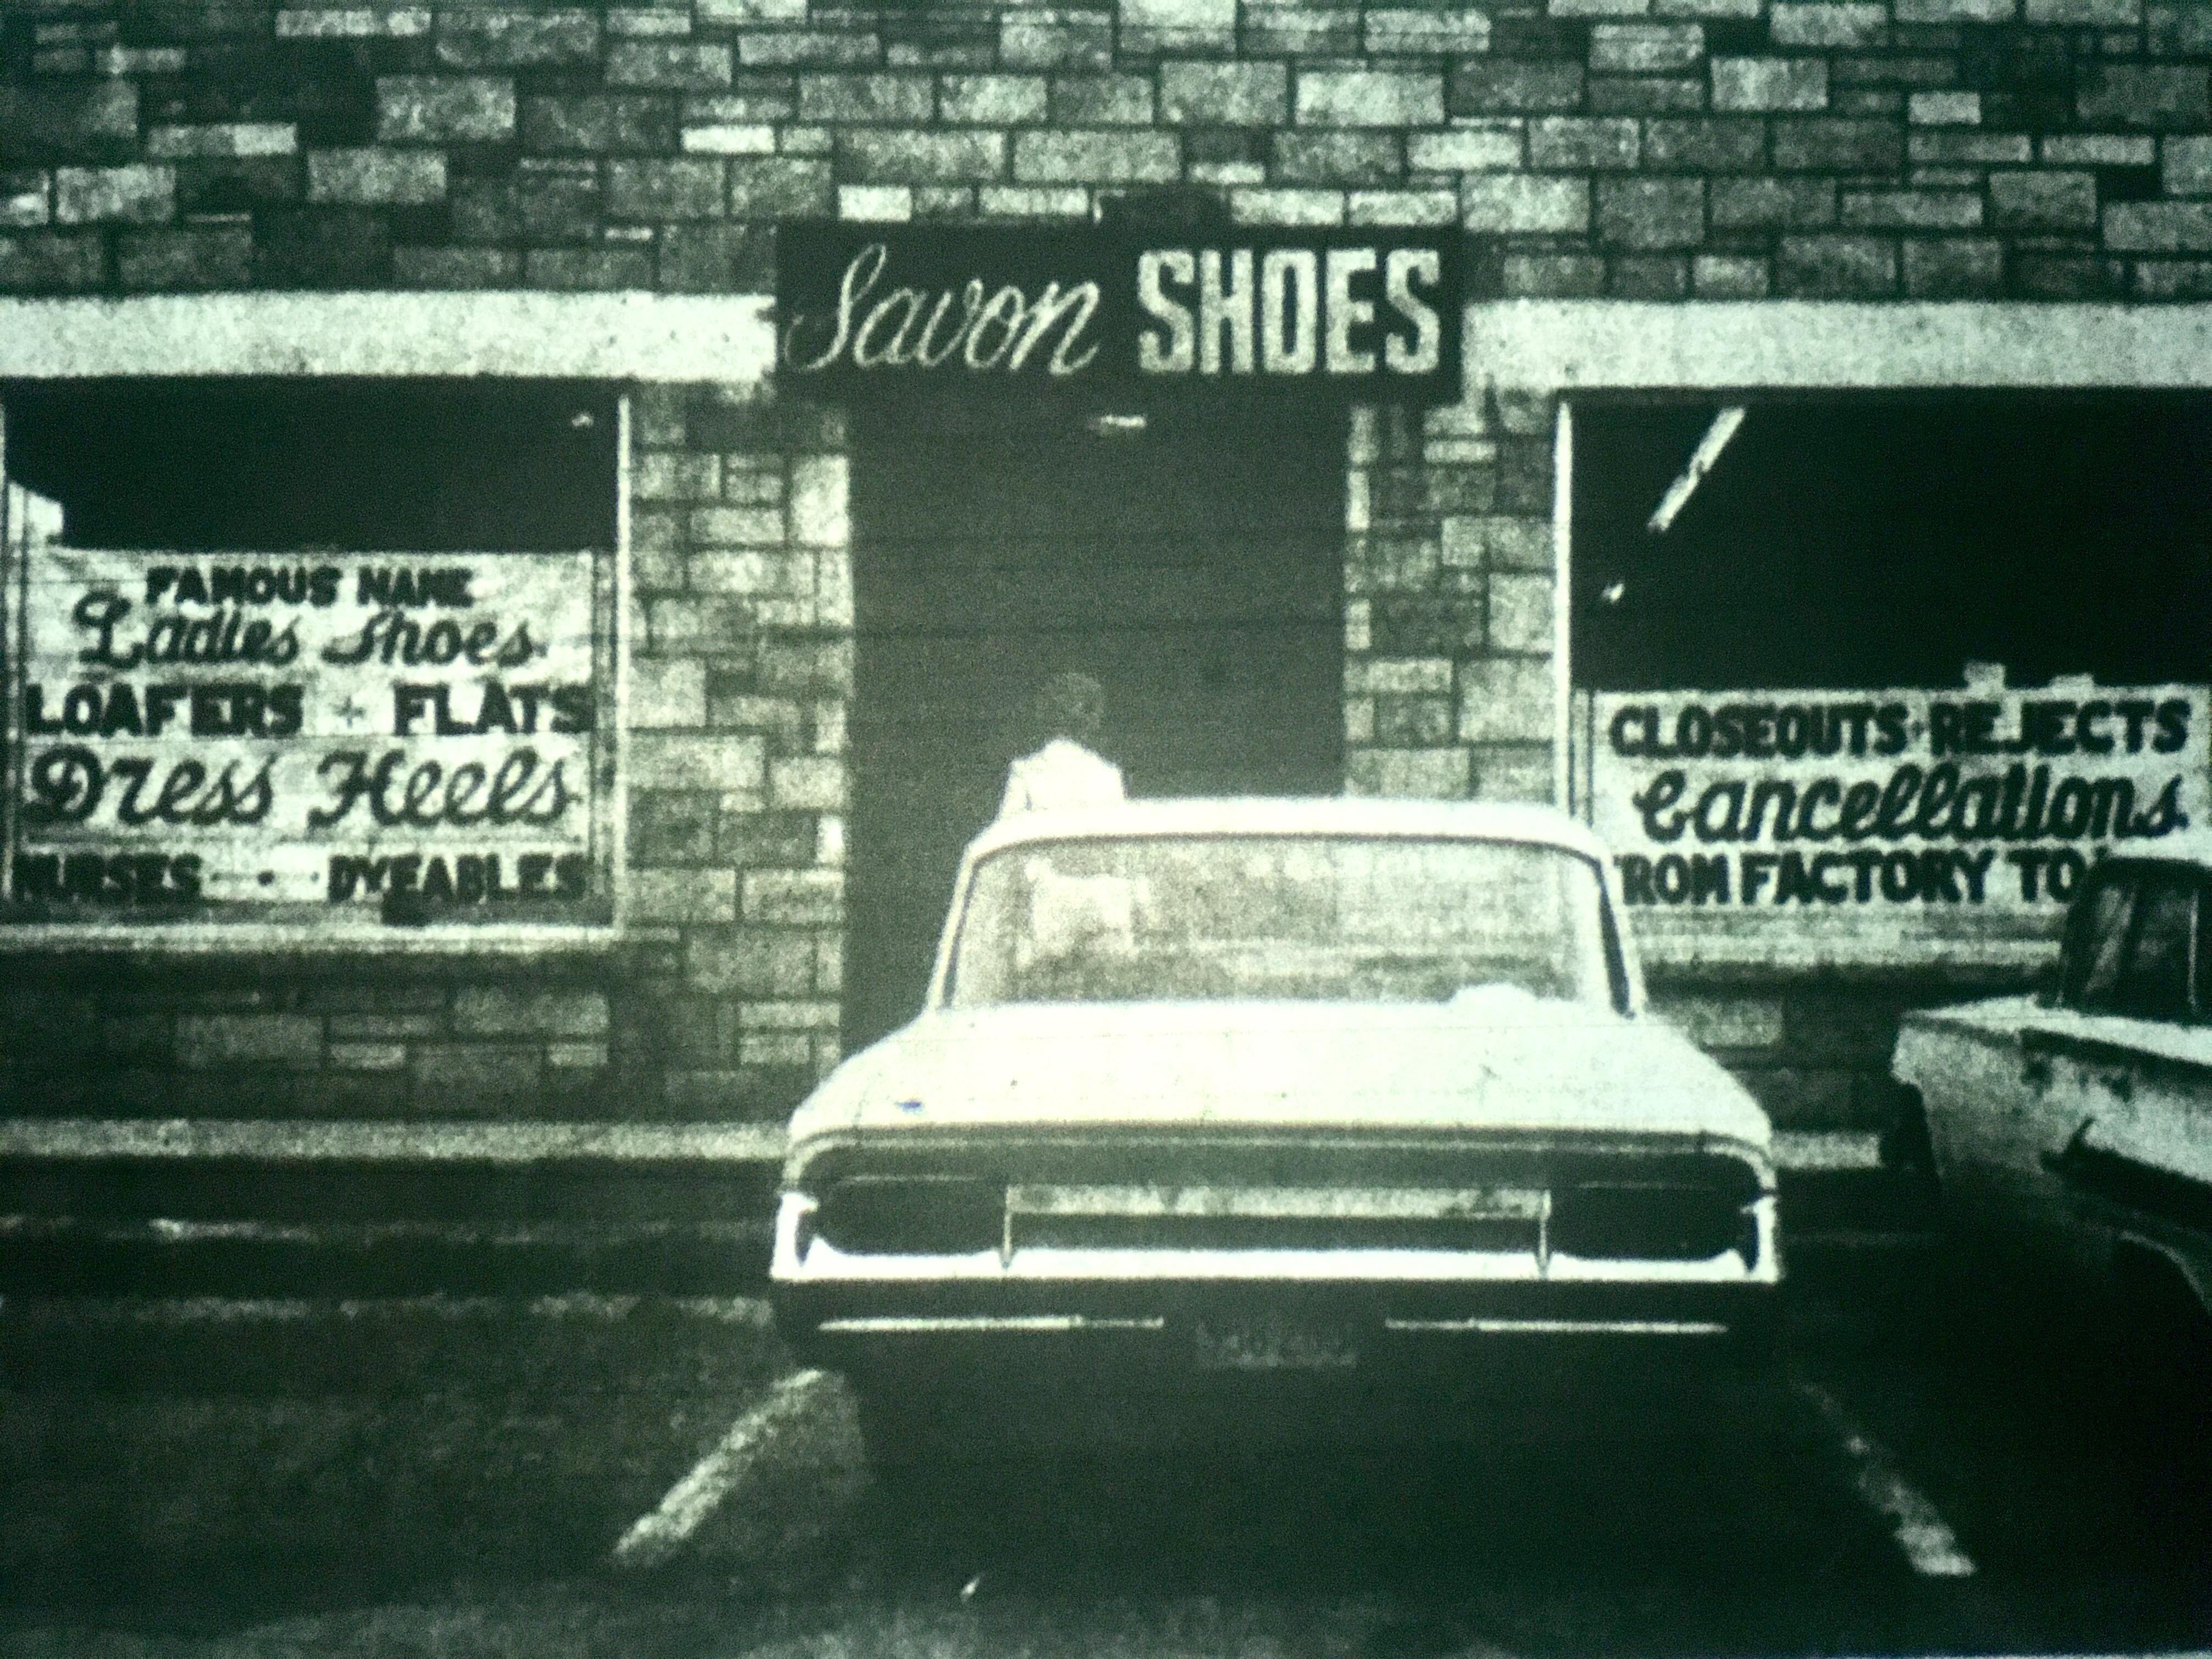 Savon shoes Burlington MA